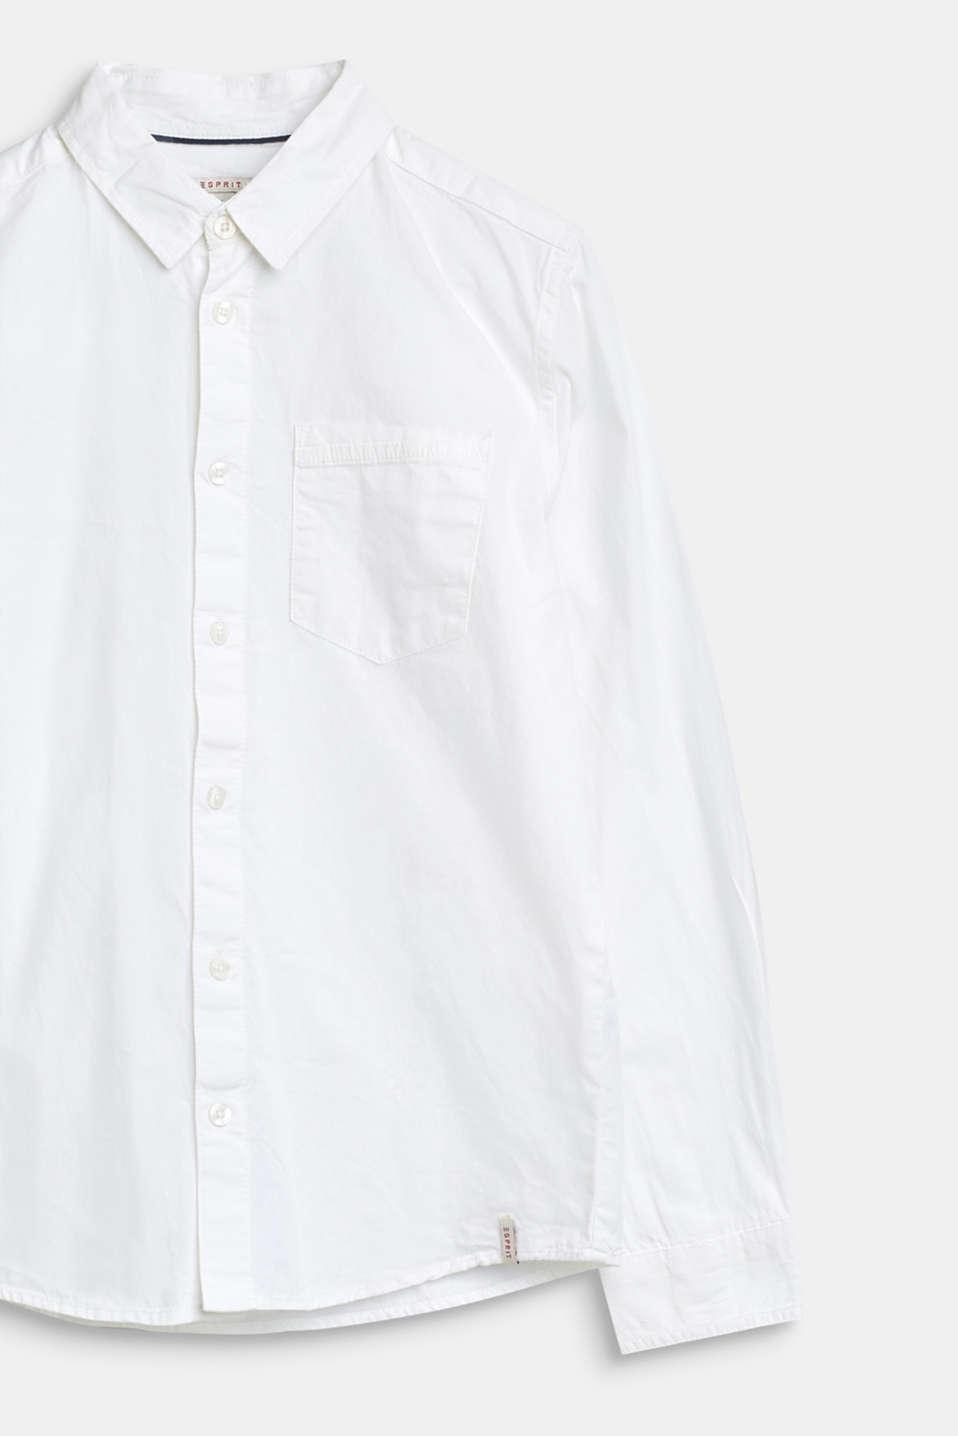 Basic shirt in 100% cotton, LCWHITE, detail image number 2